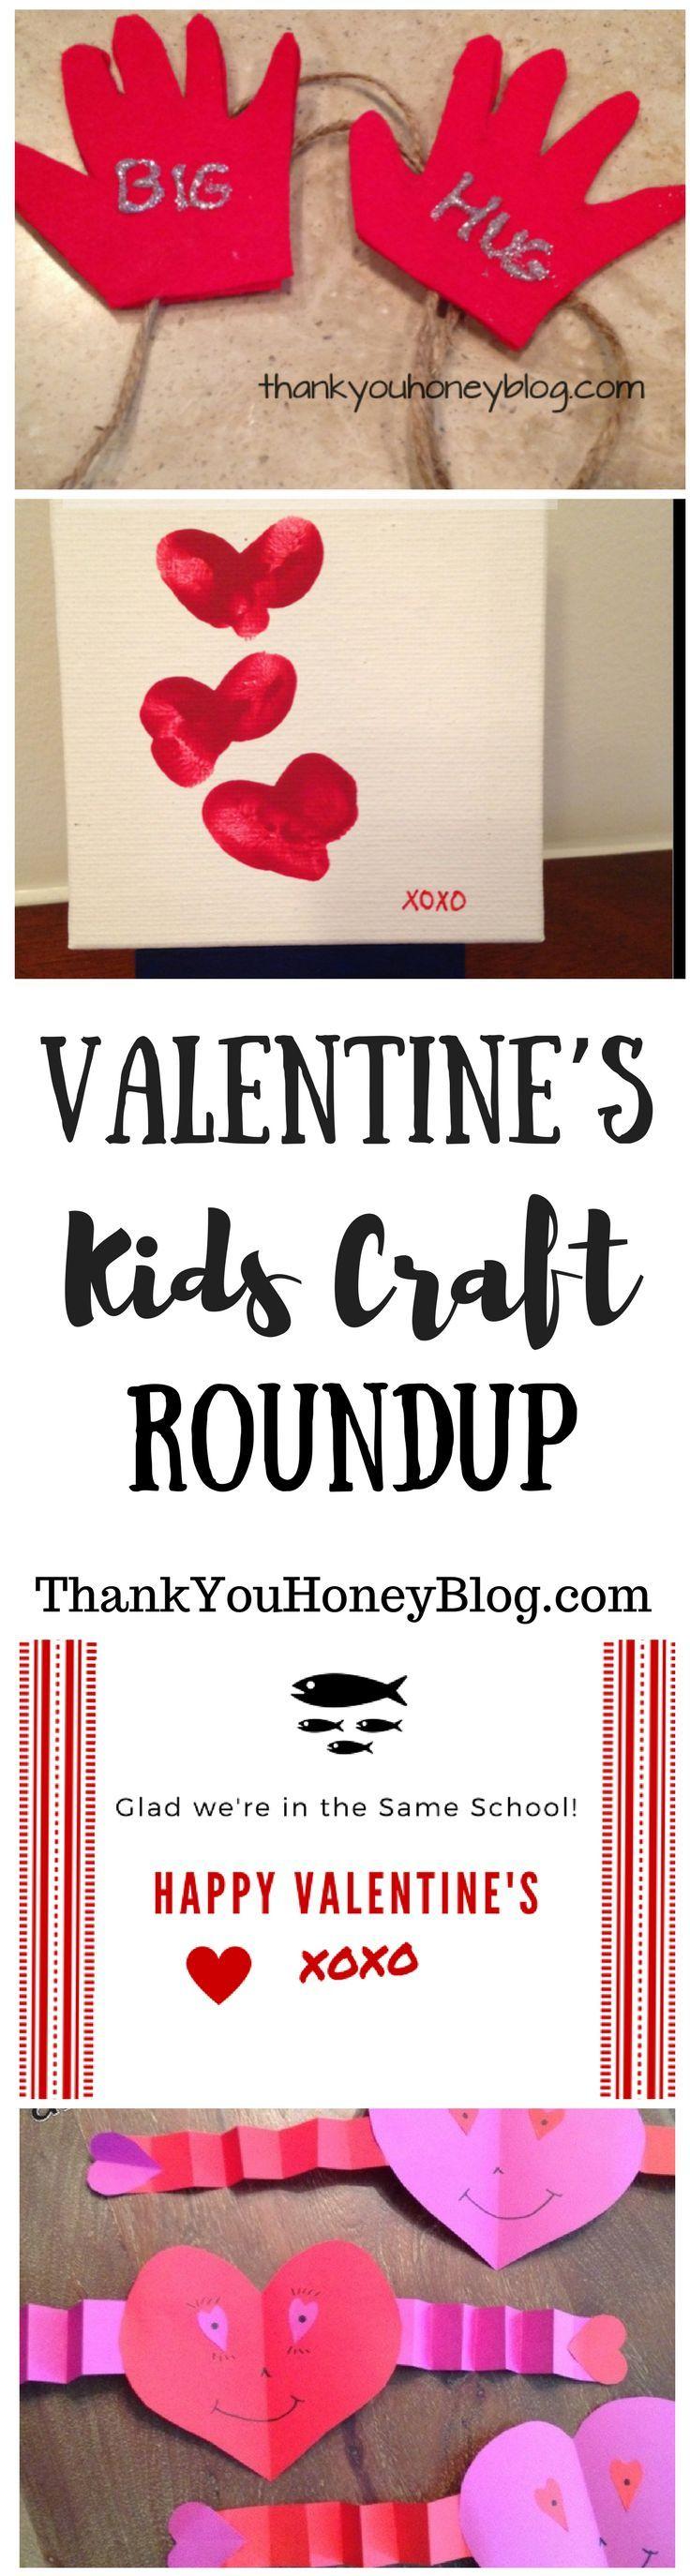 Valentine's Kids Craft Roundup,   Click through & PIN IT! Follow Us on Pinterest + Subscribe to ThankYouHoneyBlog{dot}com, arts & craft,  February 14, Valentine's Day, Kids Crafts, Valentine's Day Kids Craft Roundup, Valentines, Valentines Crafts, Non- Ca